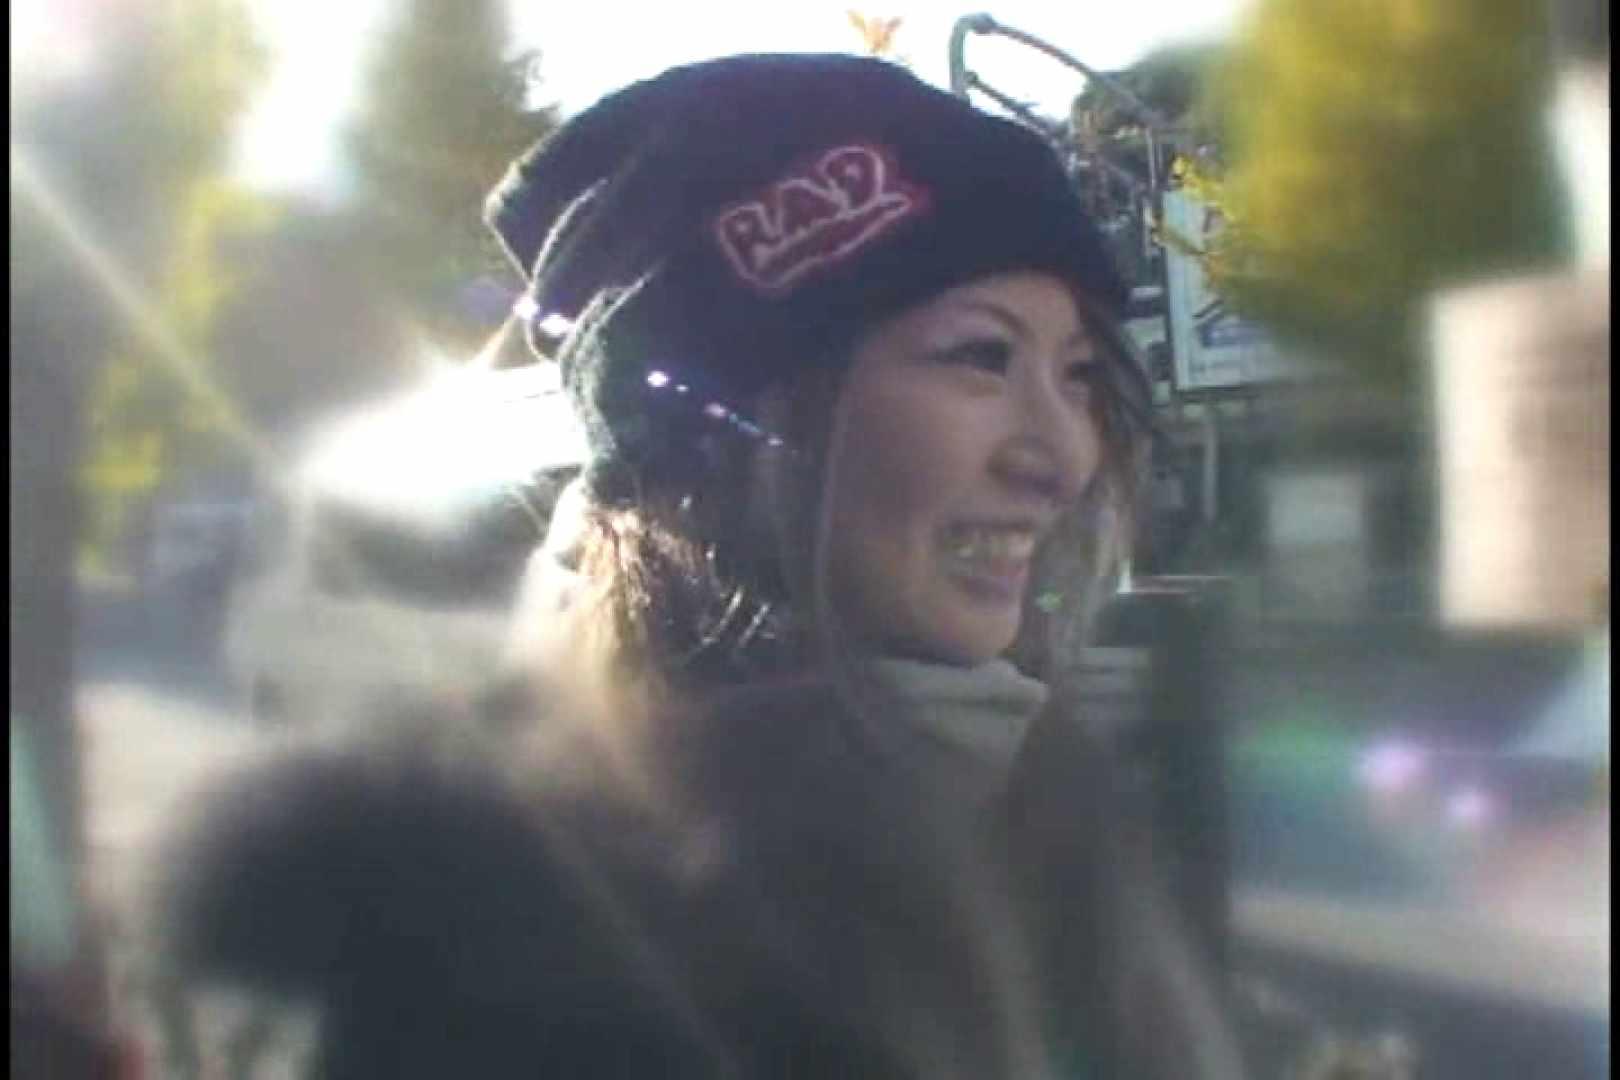 JDハンター全国ツアー vol.012 前編 女子大生のエロ動画   0  91PIX 3